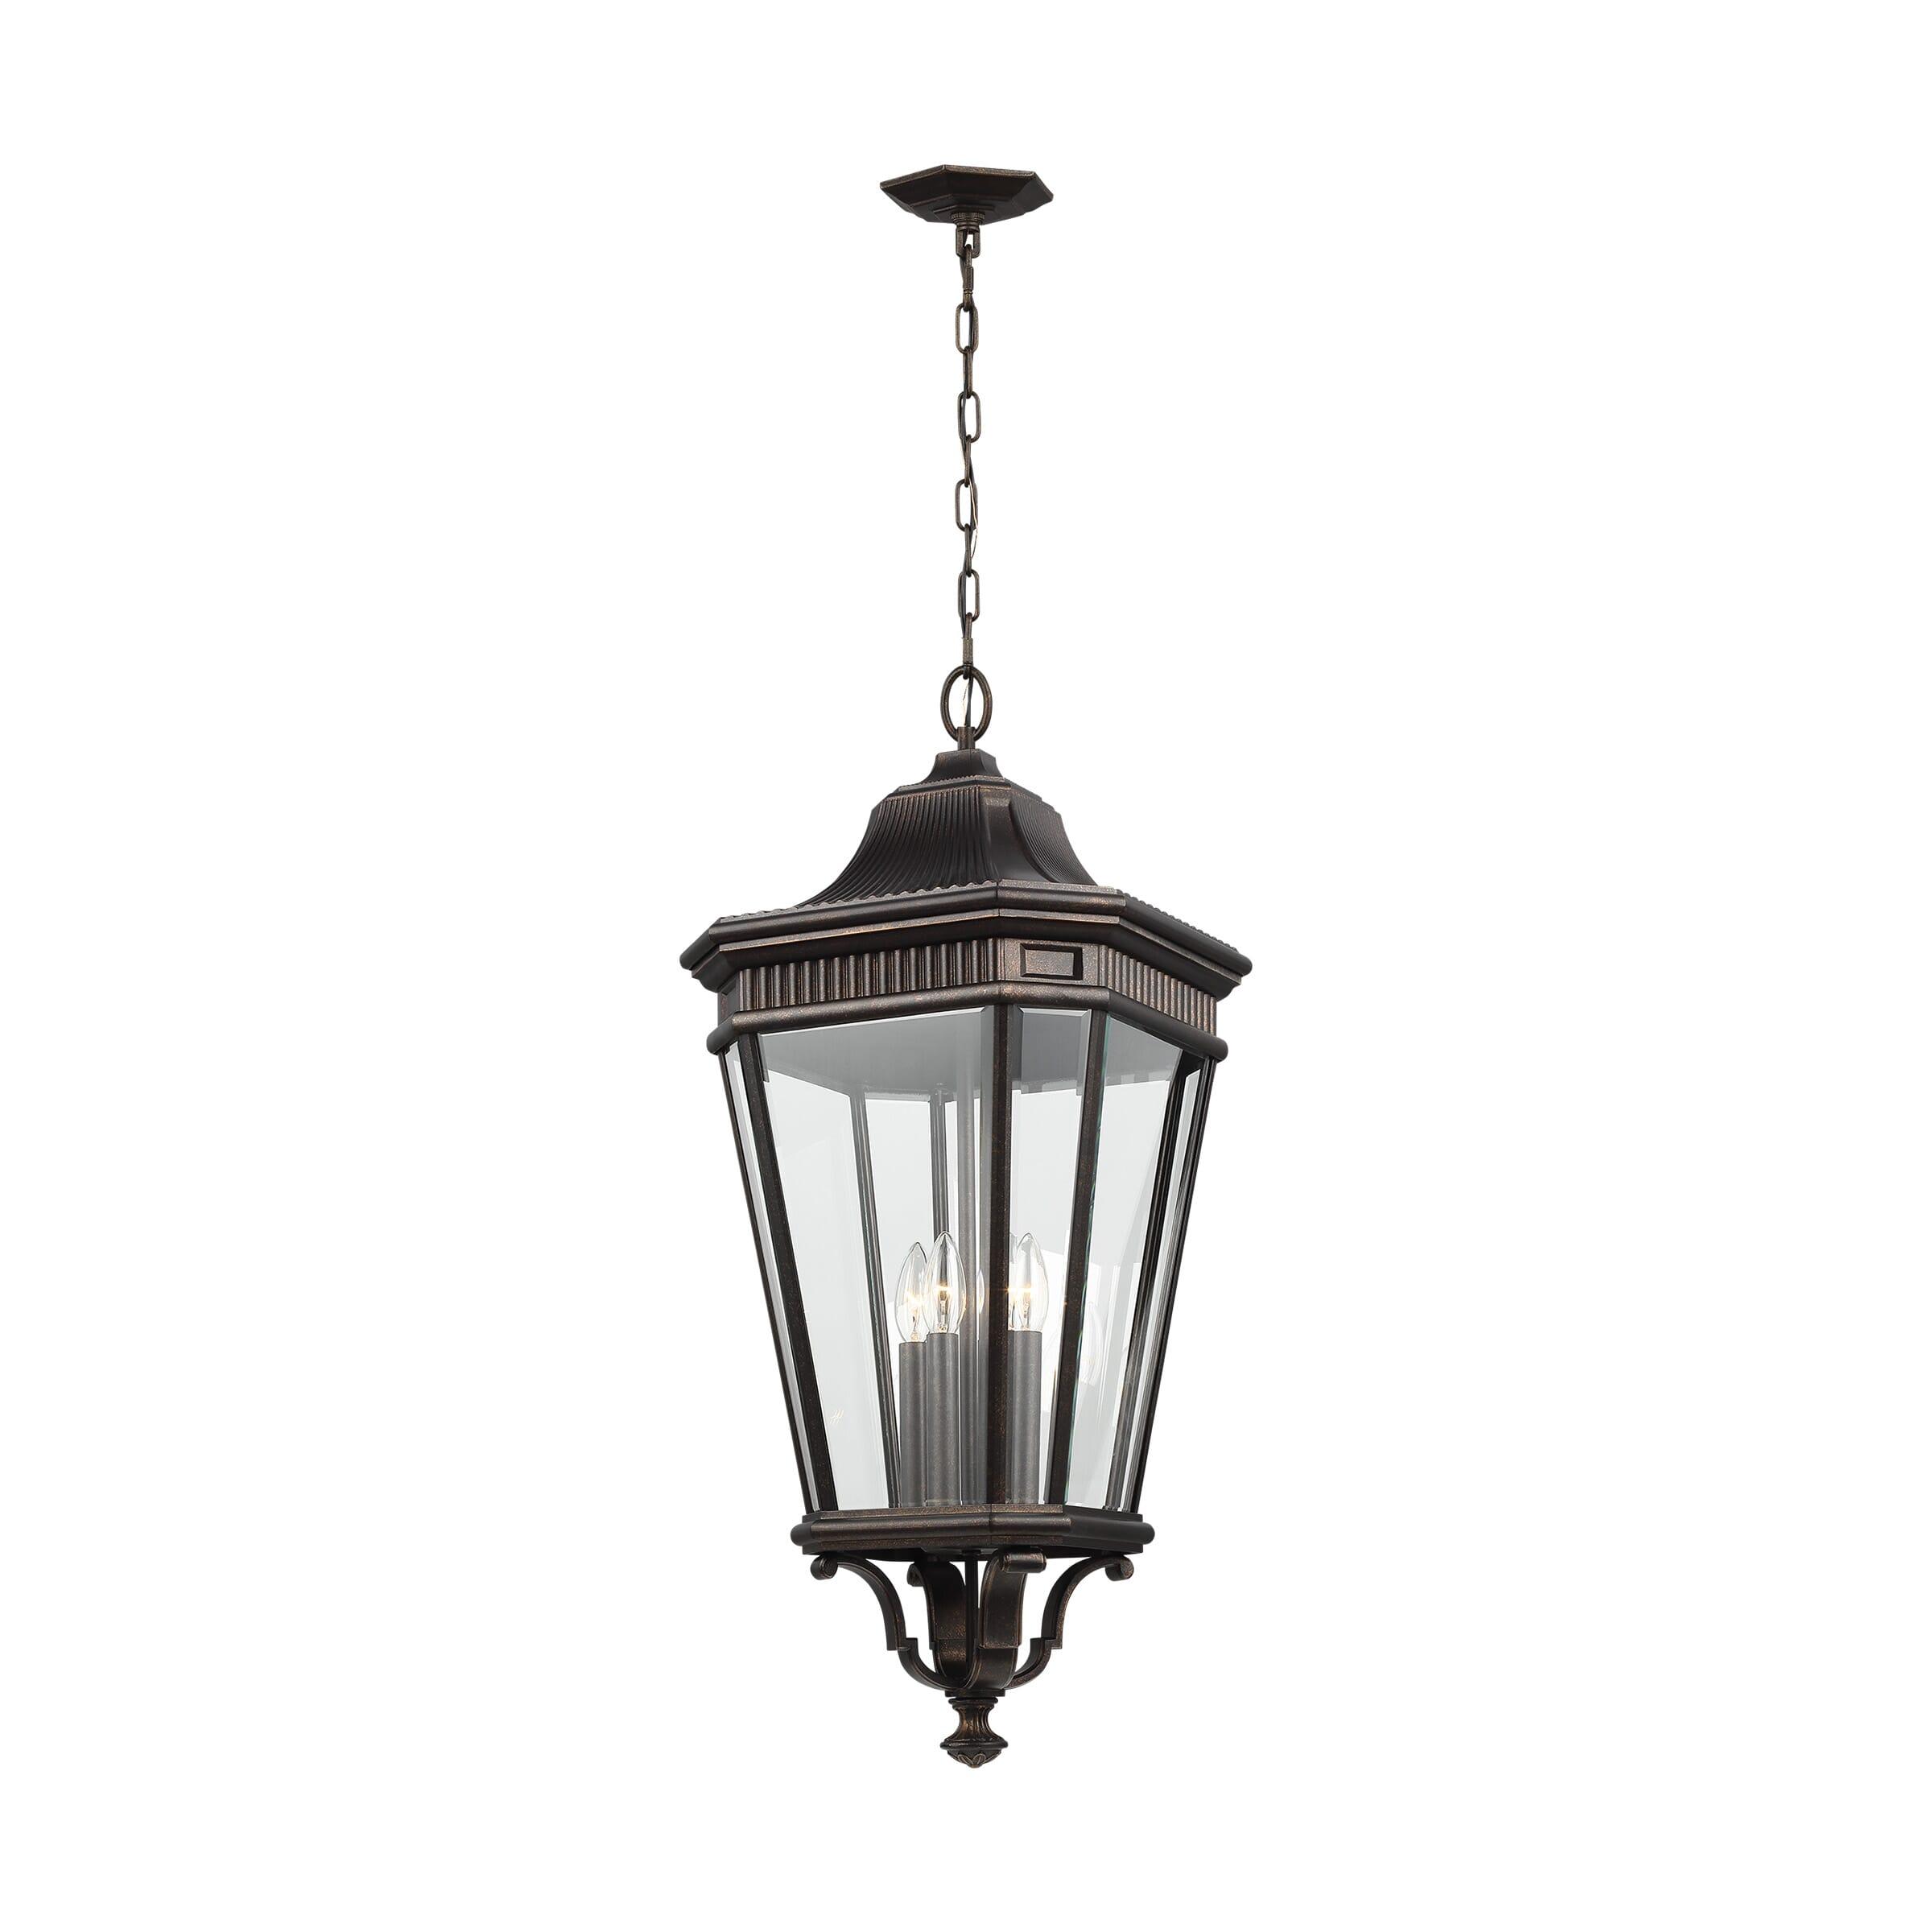 Feiss Cotswold Lane 4-Light Hanging Lantern in Grecian Bronze